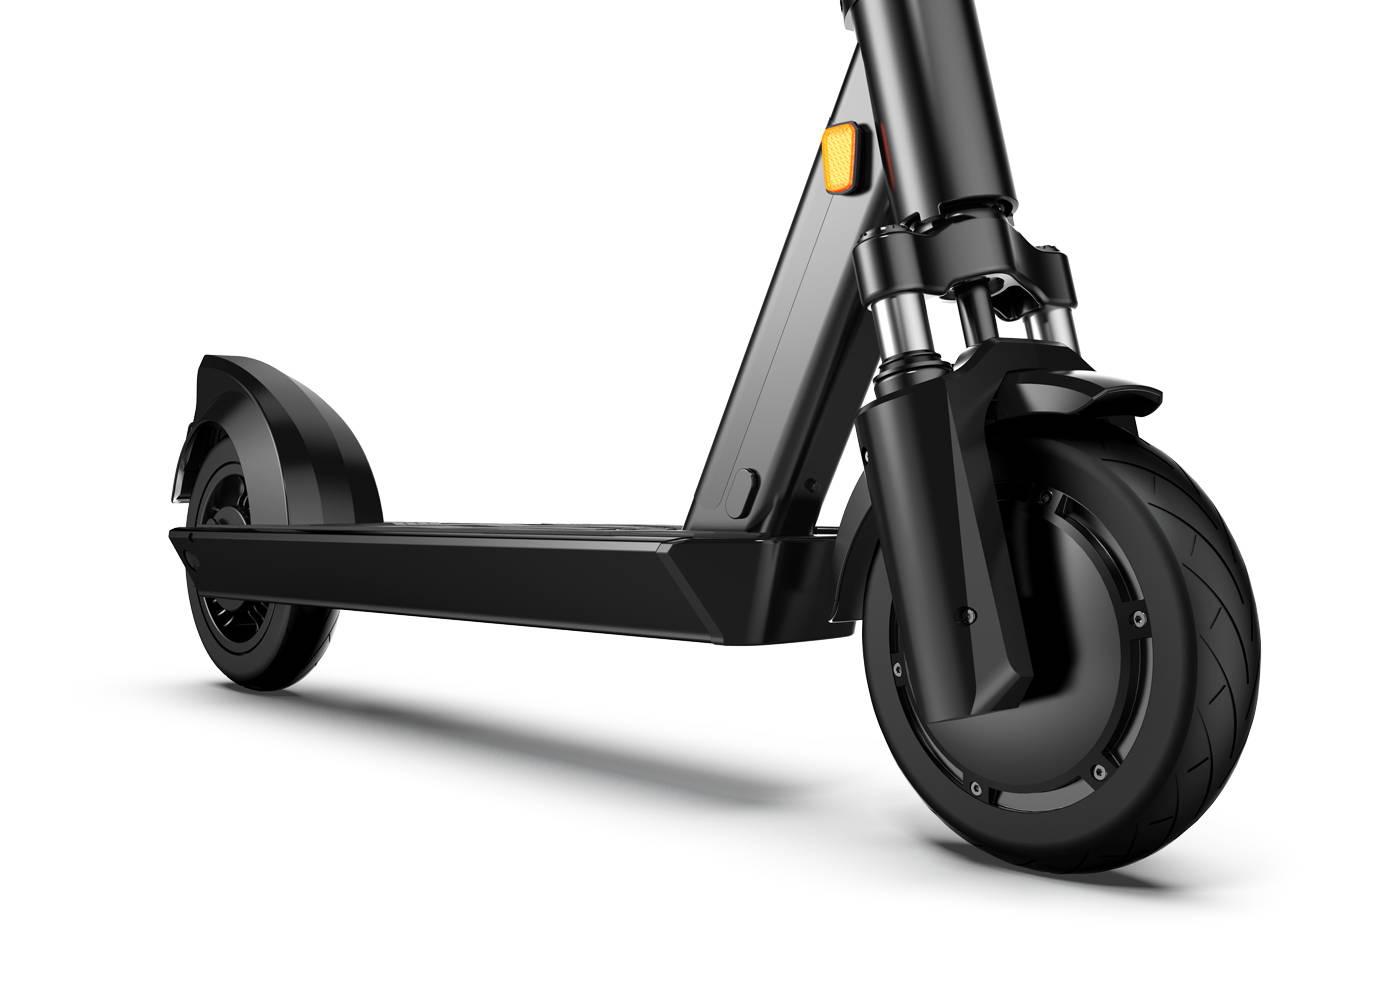 okai-ES200D-electric-scooter-front-wheel-motor-suspension